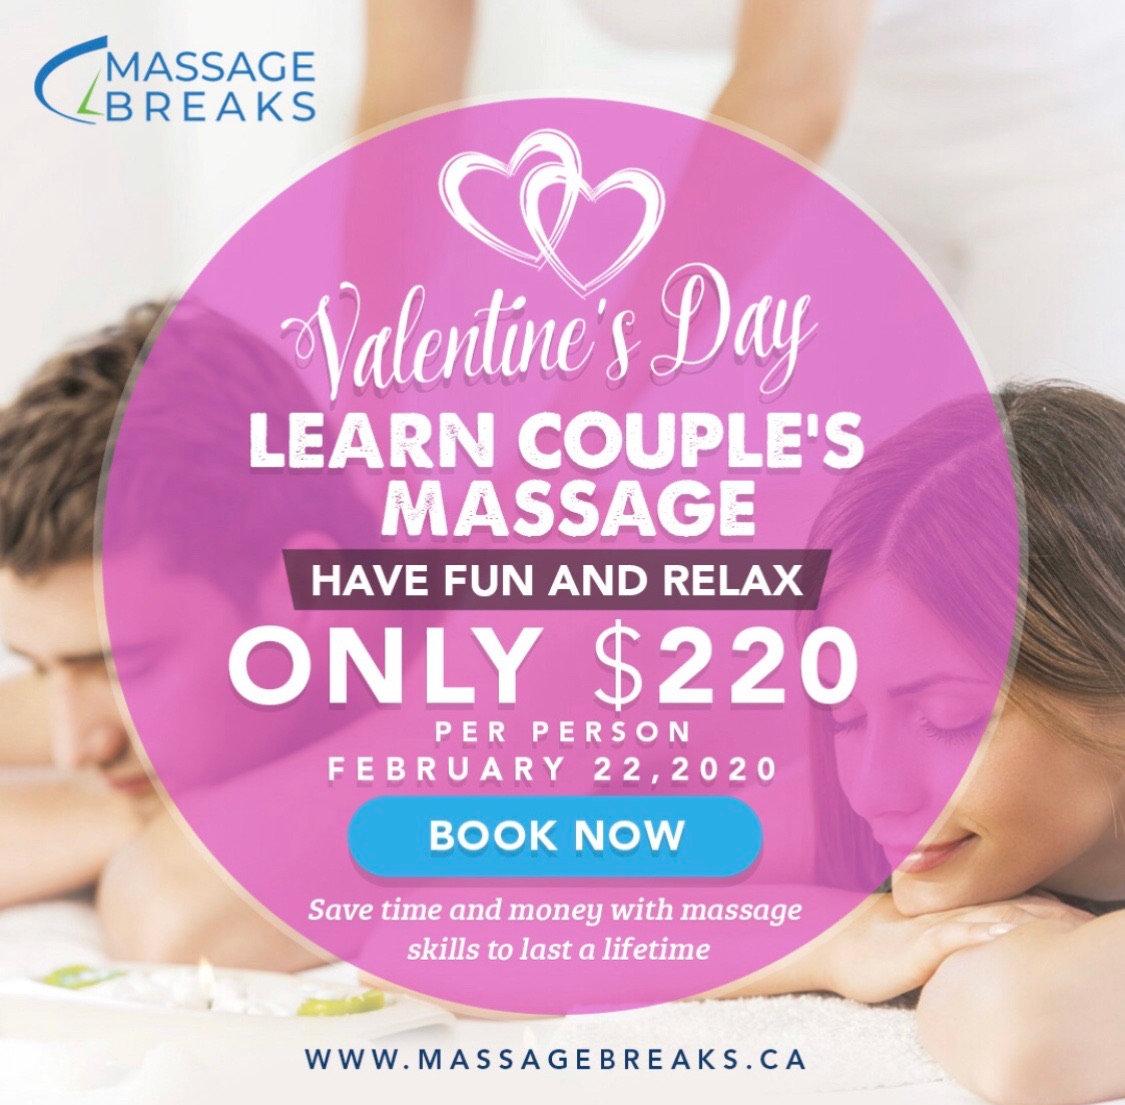 Learn Couple's Massage